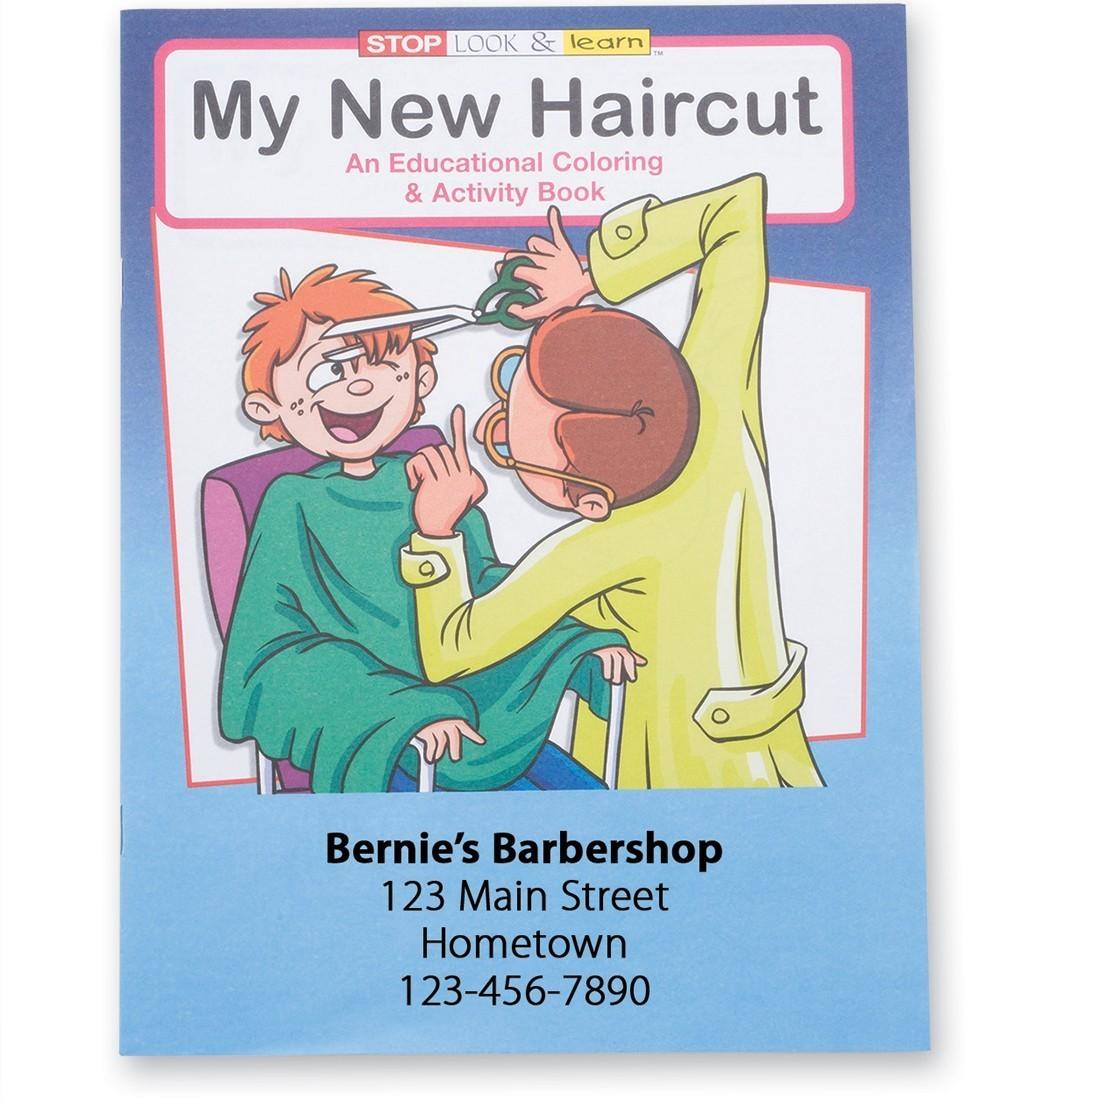 Custom My New Haircut Coloring Book [image]